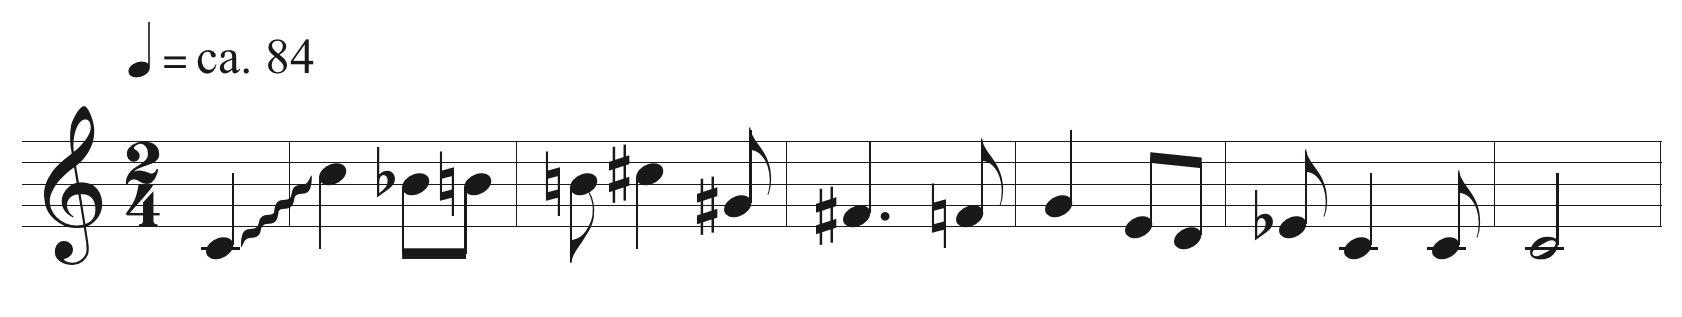 earl wild piano transcriptions sheet music